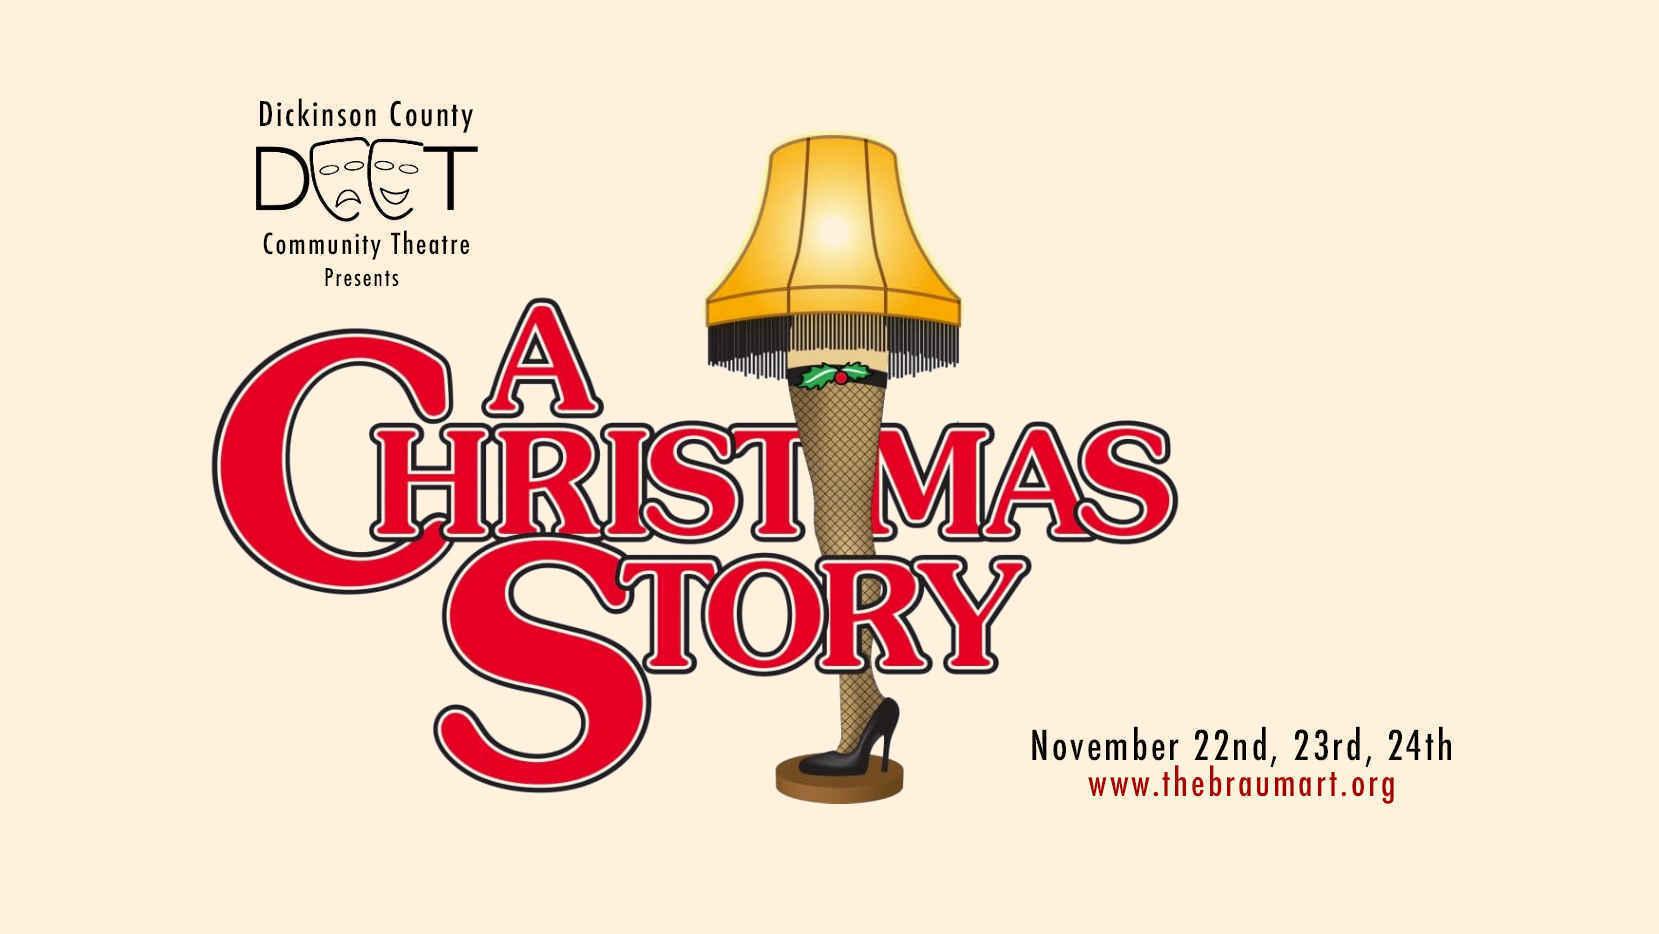 DCCT Presents A Christmas Story (November 24th Matinee) image